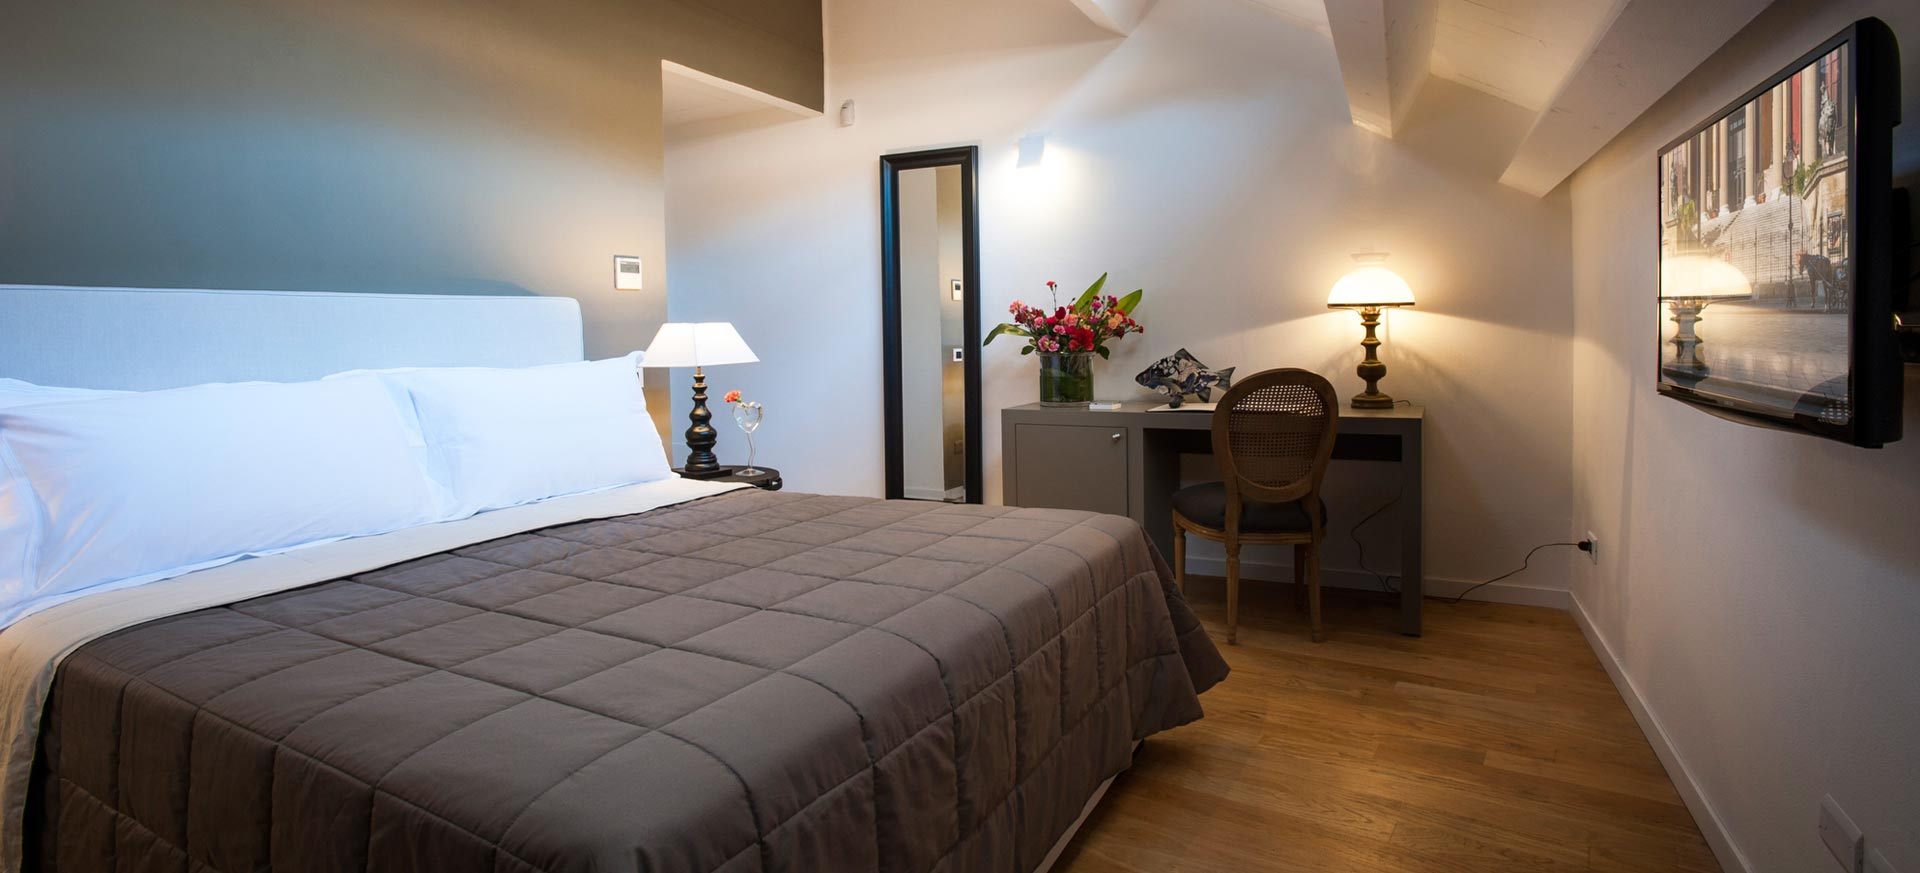 chambre d 39 h te palerme sicile hote italia. Black Bedroom Furniture Sets. Home Design Ideas